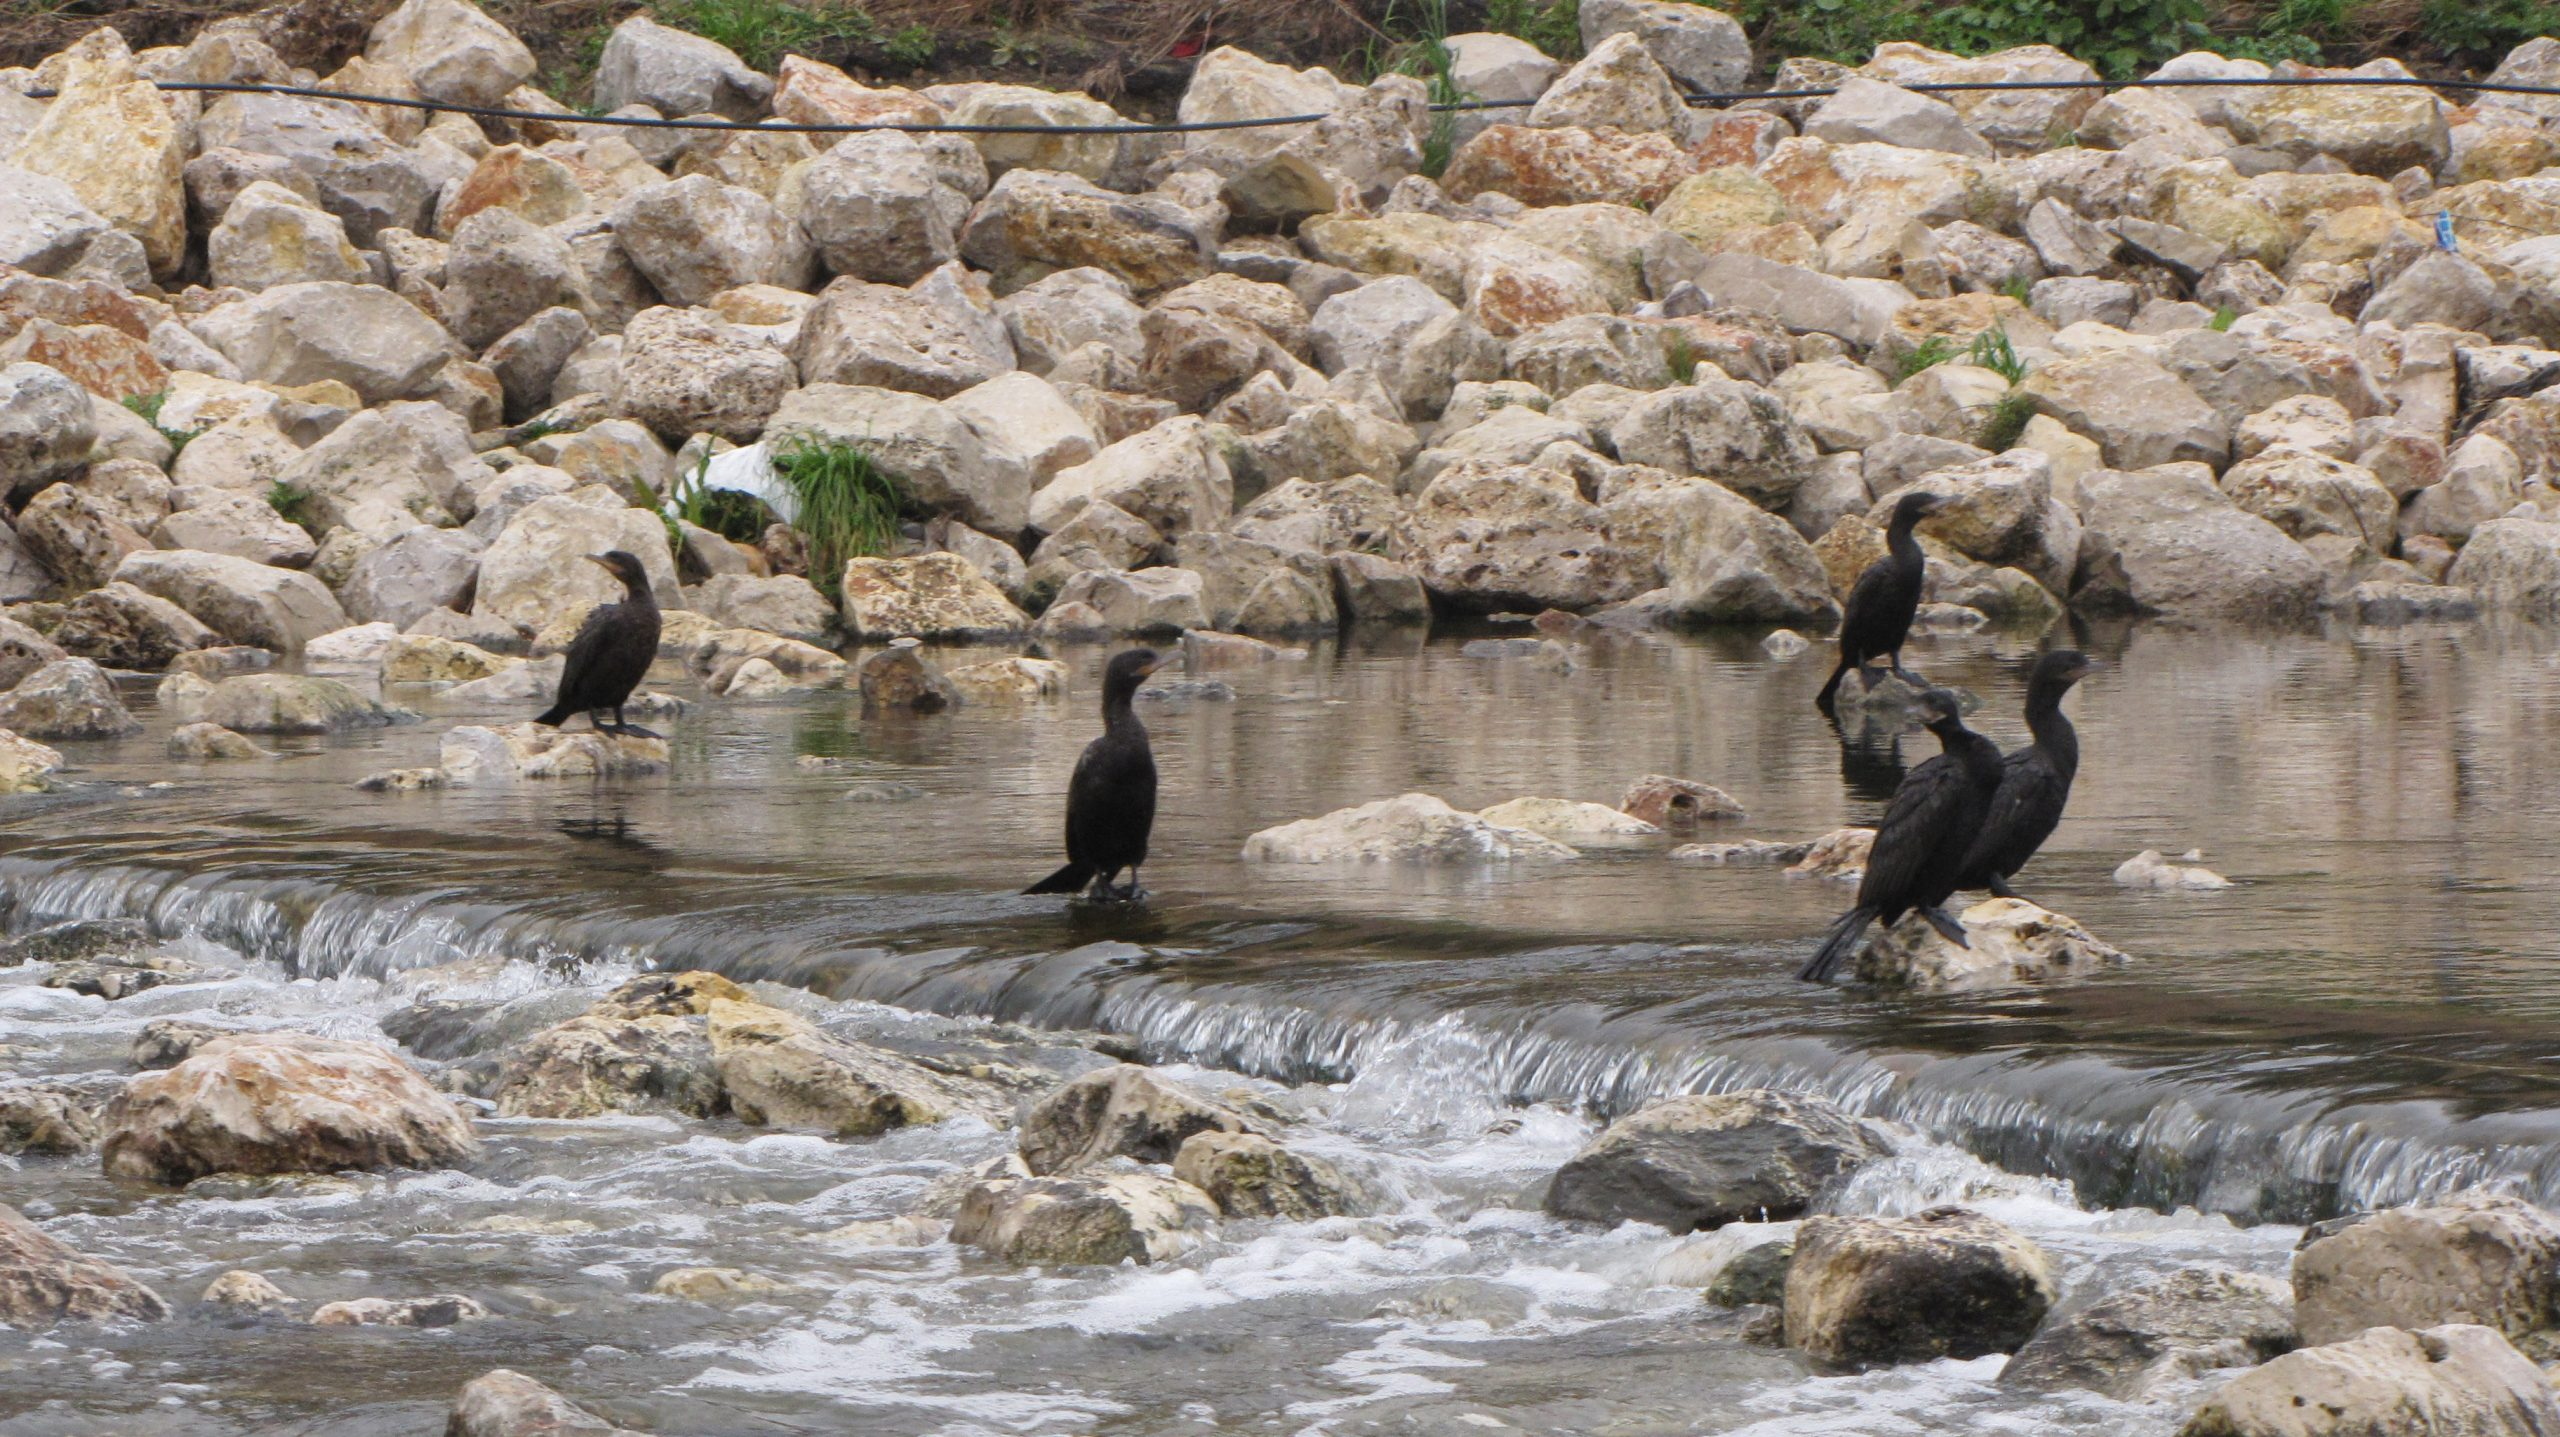 Cormorants fishing in a riffle on the San Antonio Mission Reach